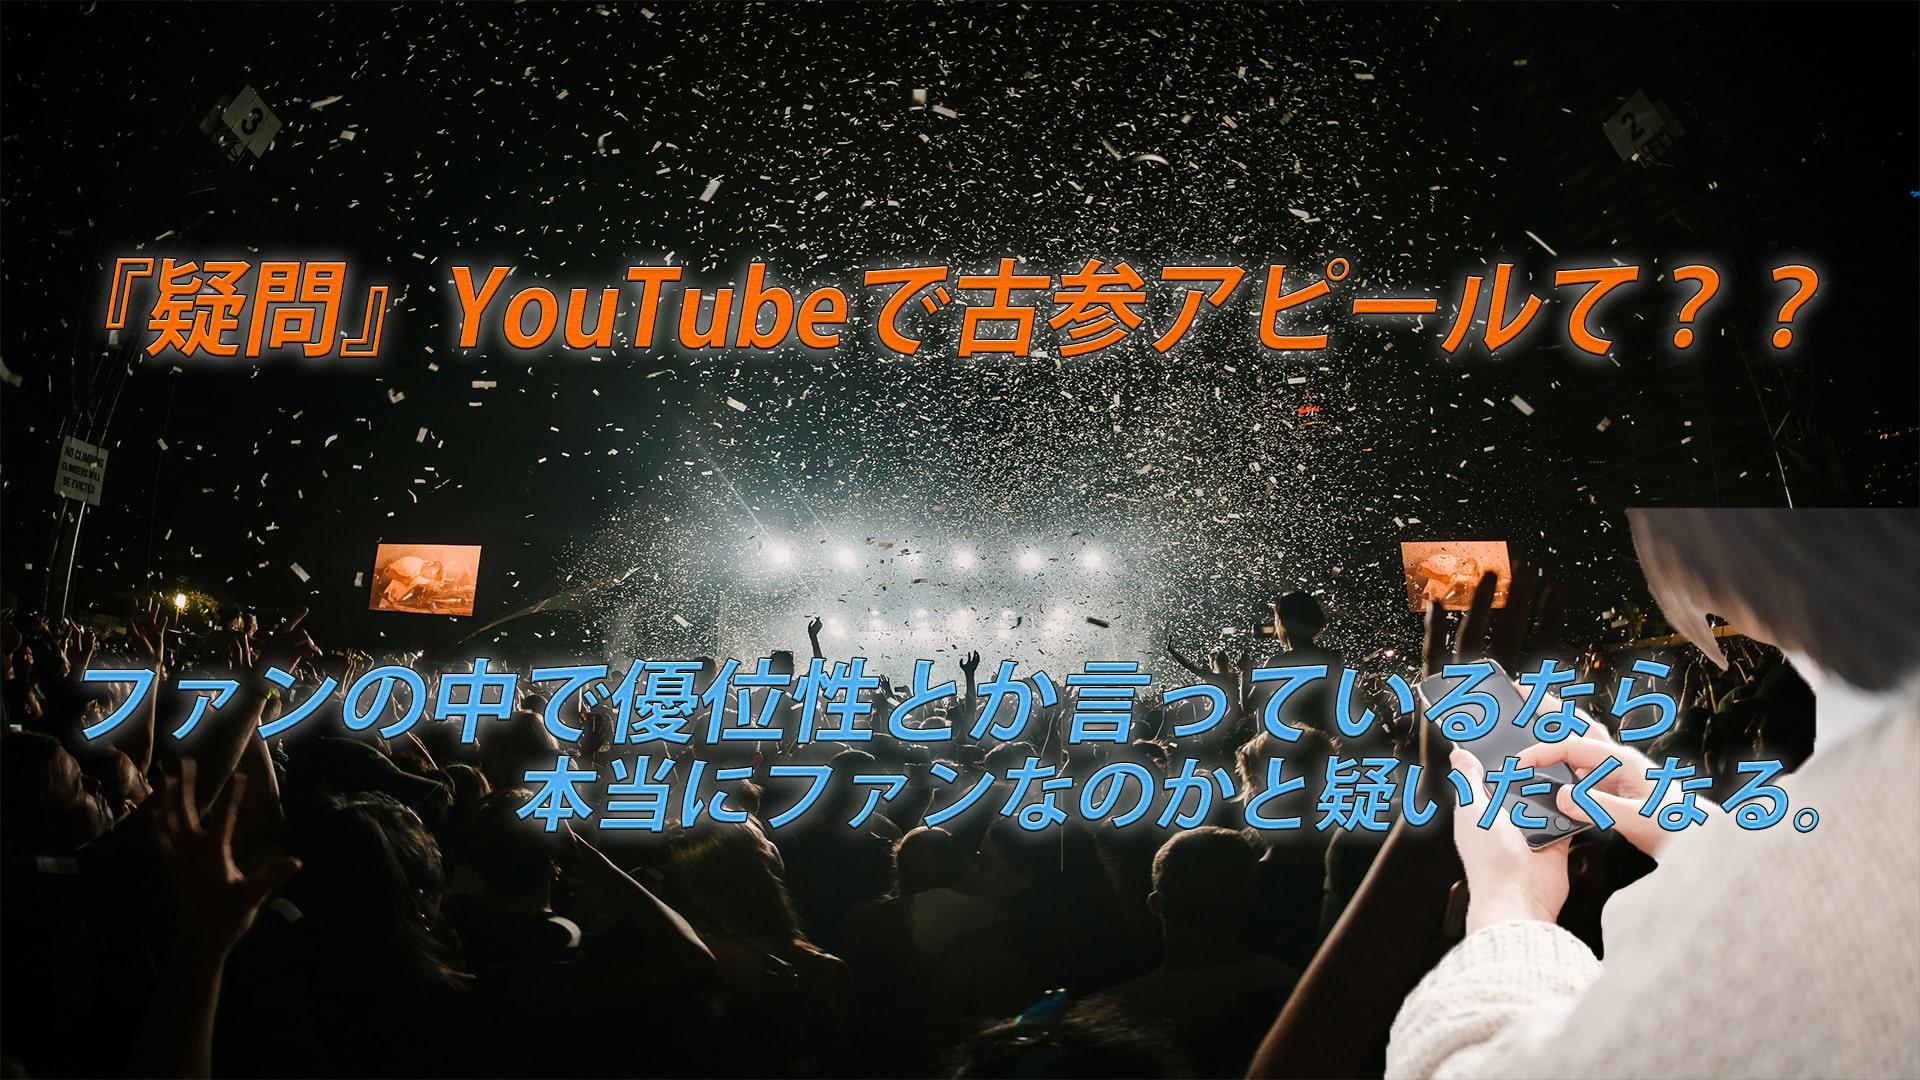 YouTubeのコメントで古参アピしよて何で優位性を求めているの?